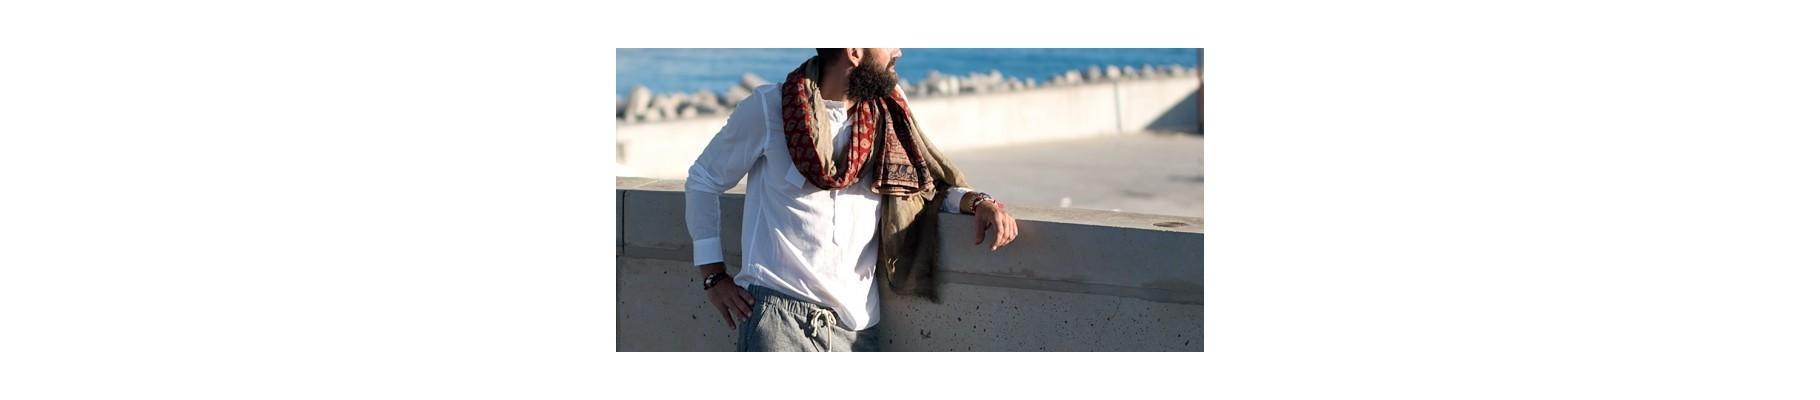 Scarves and foulards for men at Suneoline